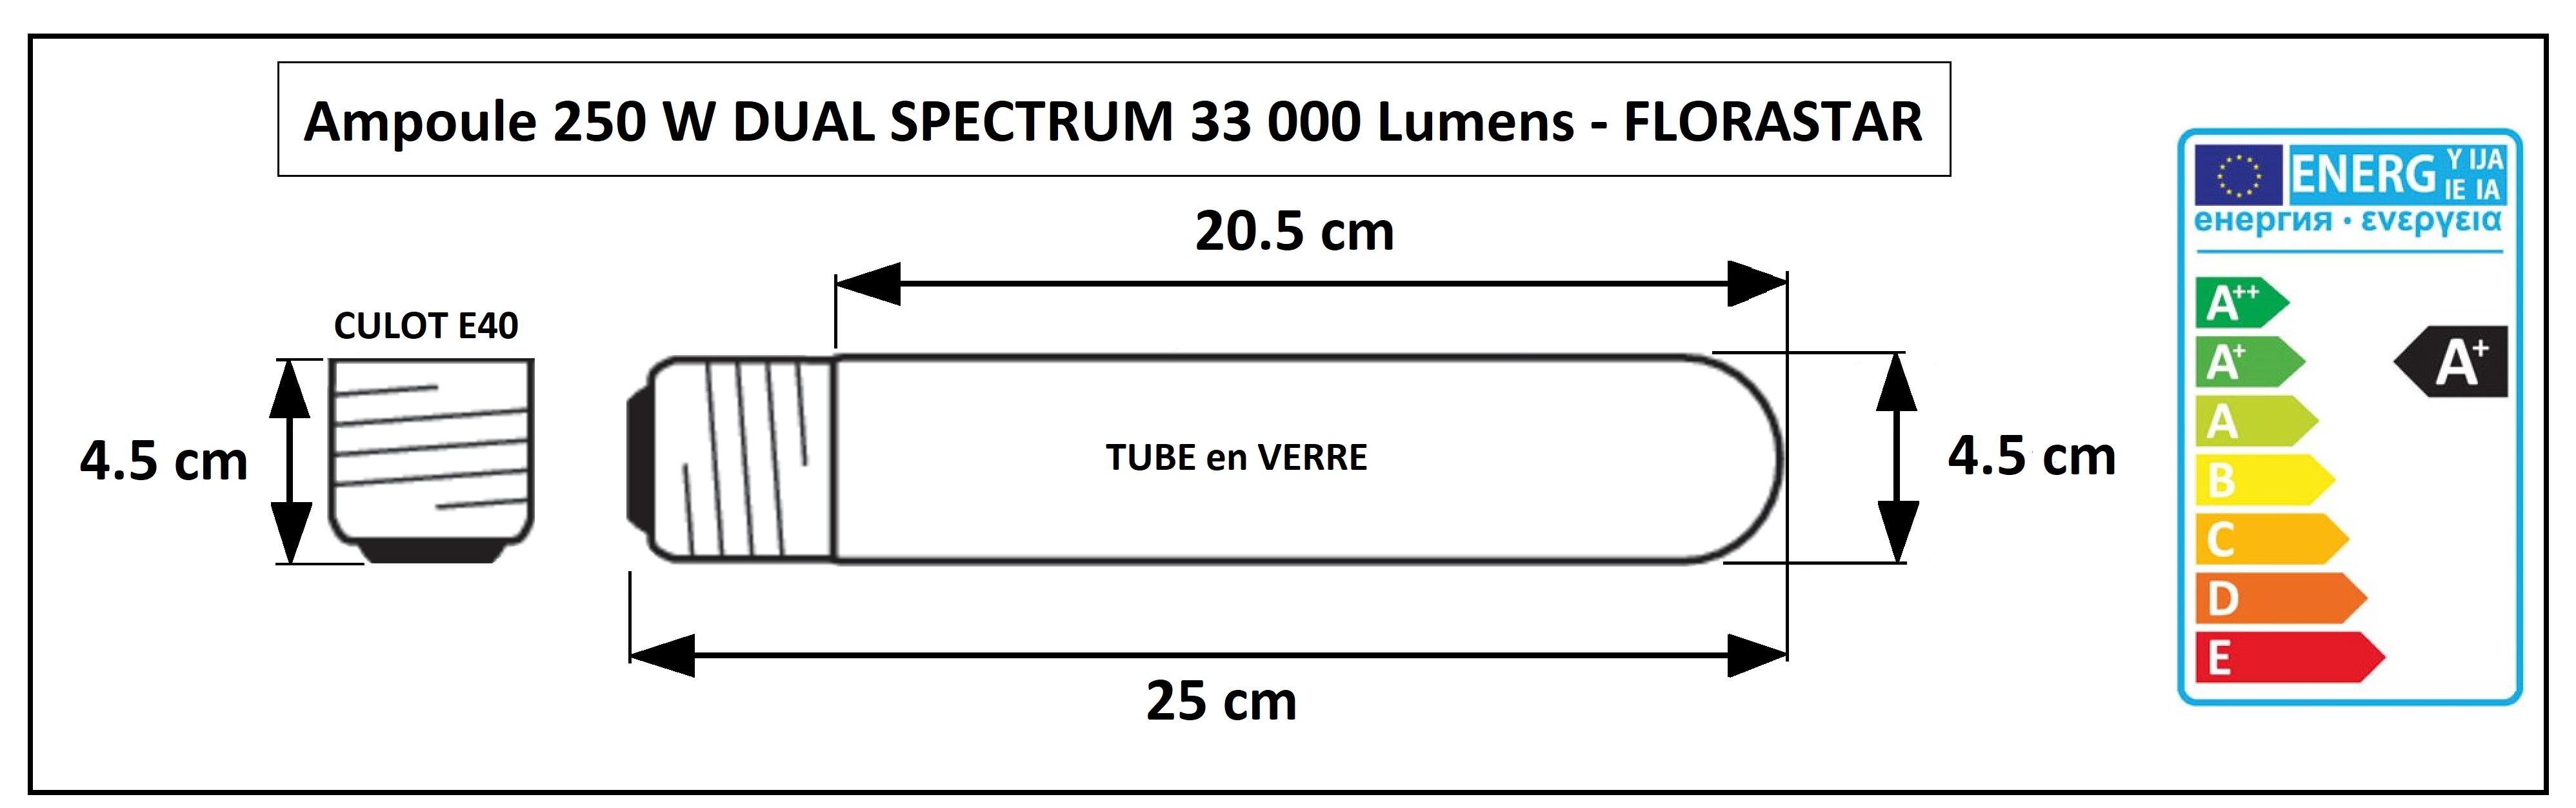 Dimensions de la lampe HPS double spectre 250W Florastar